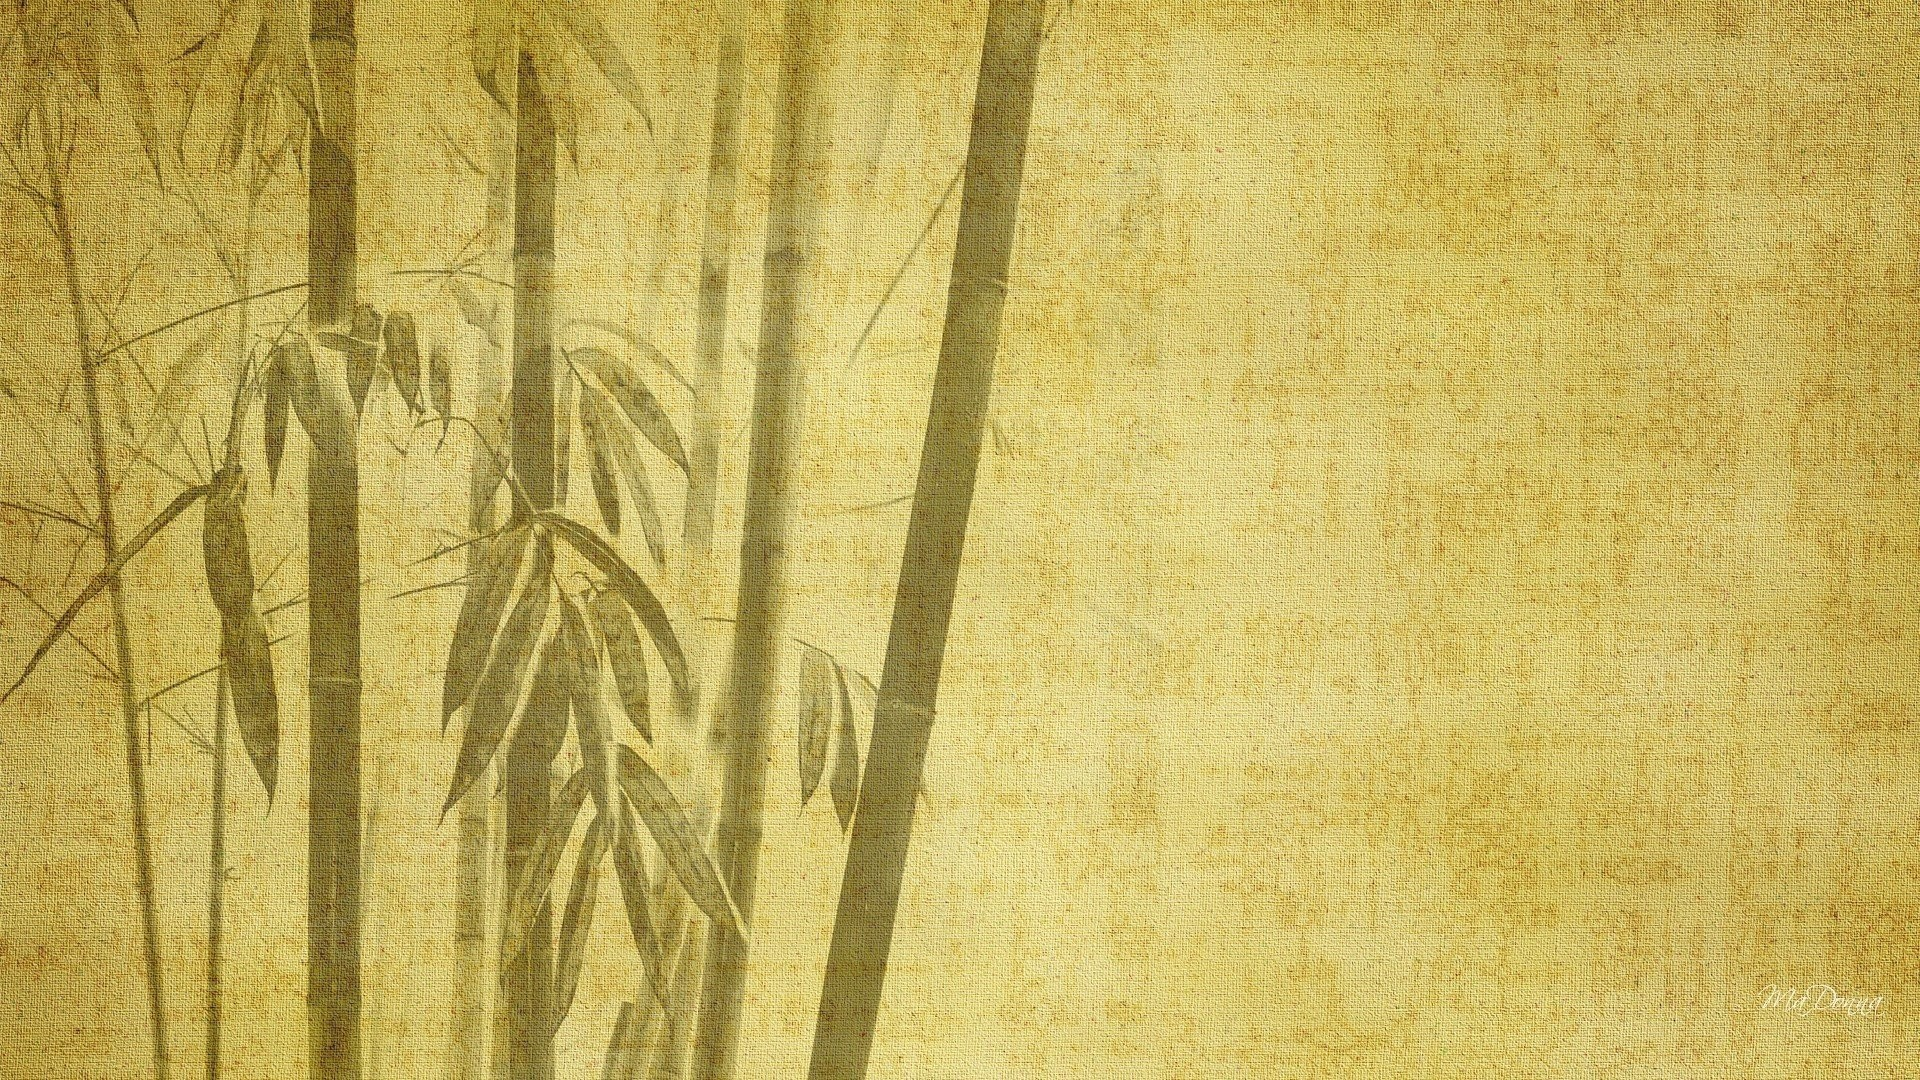 digital art oriental drawings backgrounds simple wallpaper background .